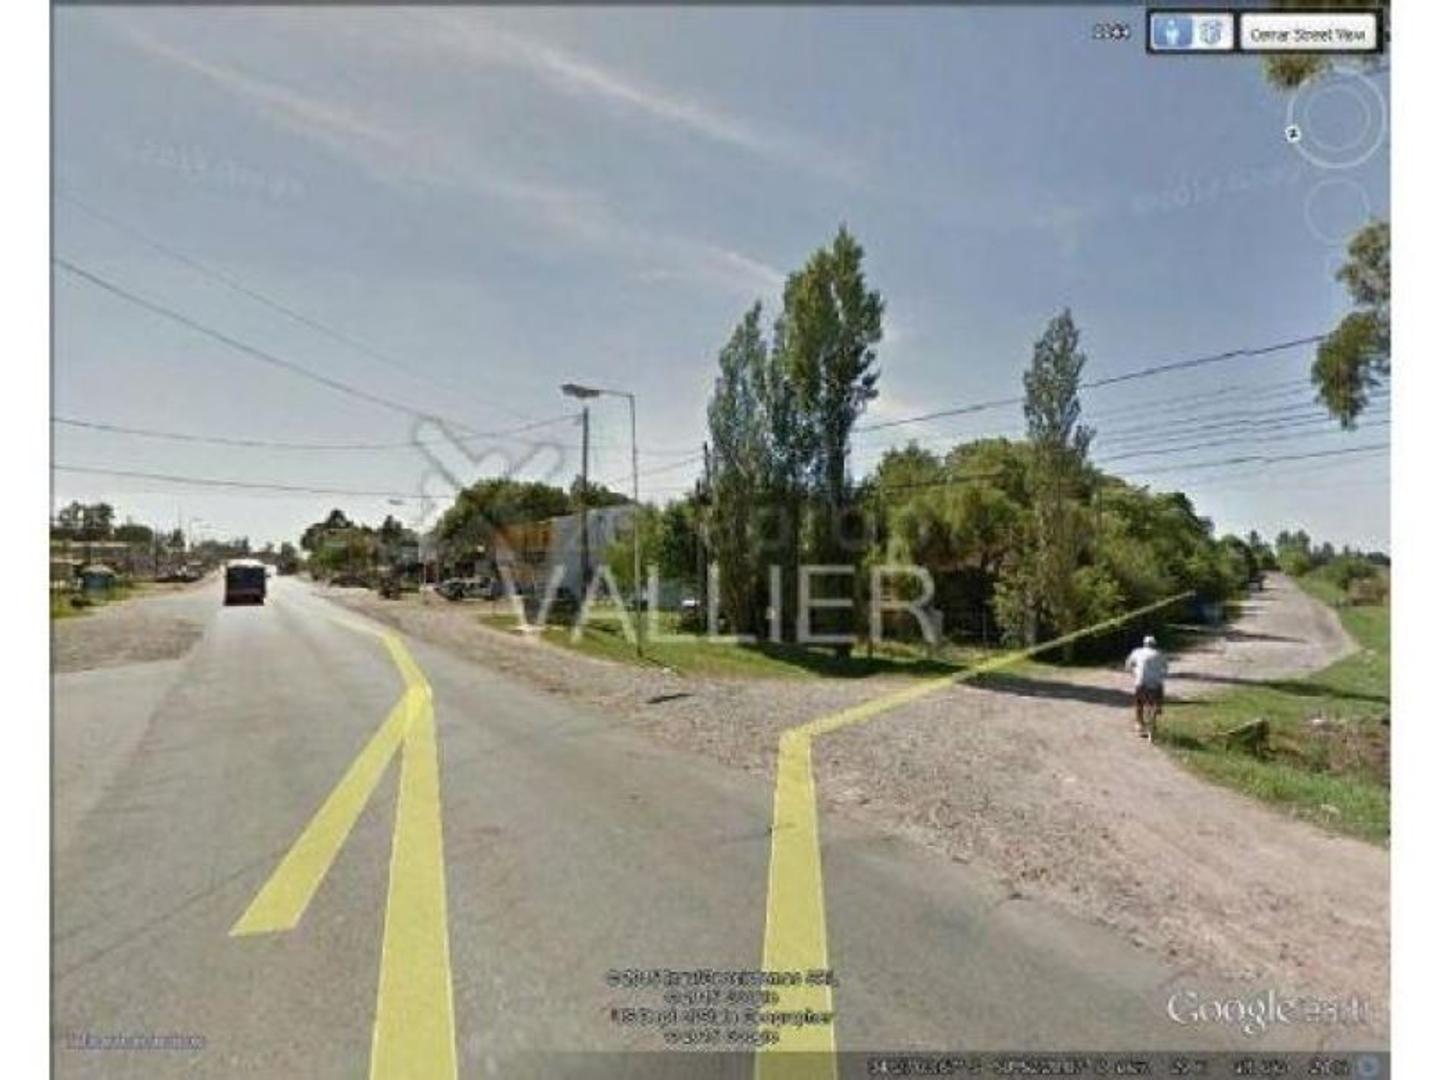 Alquiler de Local en  Zona Pilar, Gran Bs.As., Argentina, Ambrossetti y Ruta 8 - km 50,5